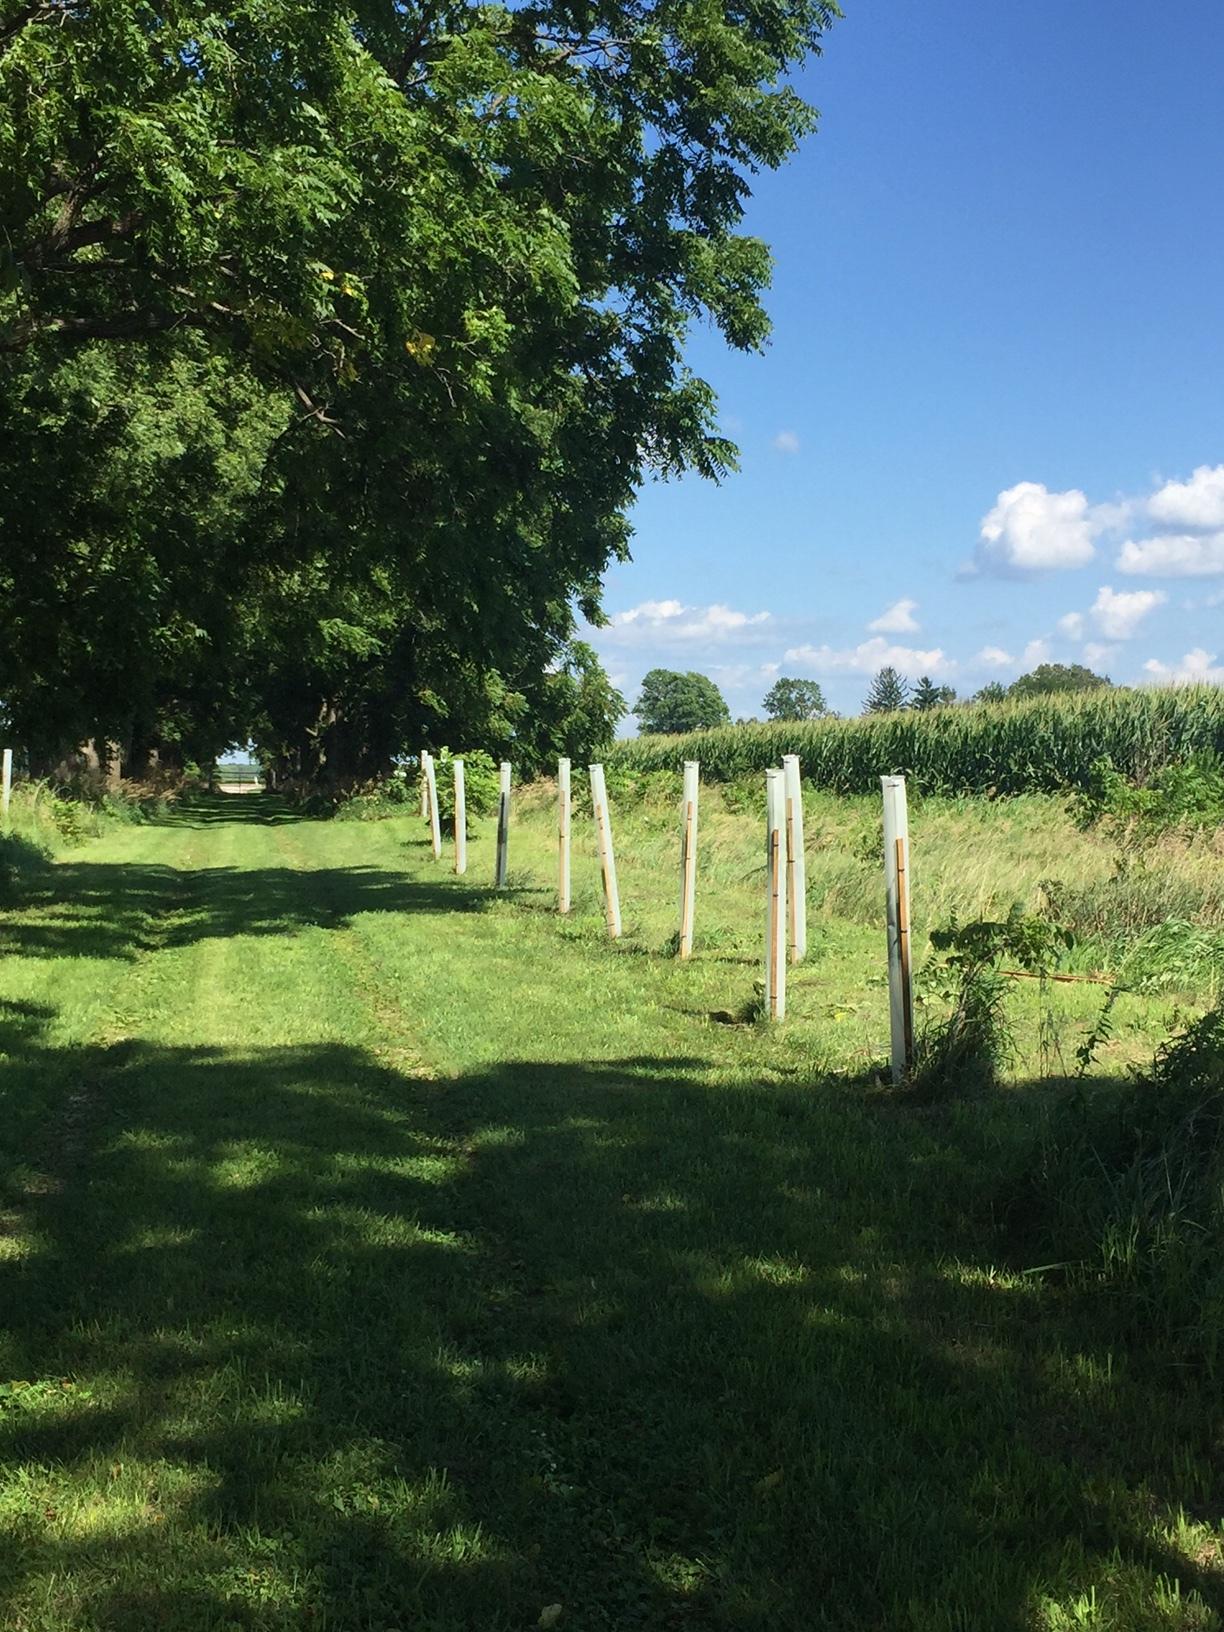 Black Walnut Trees In Tree Pro Grow Tubes